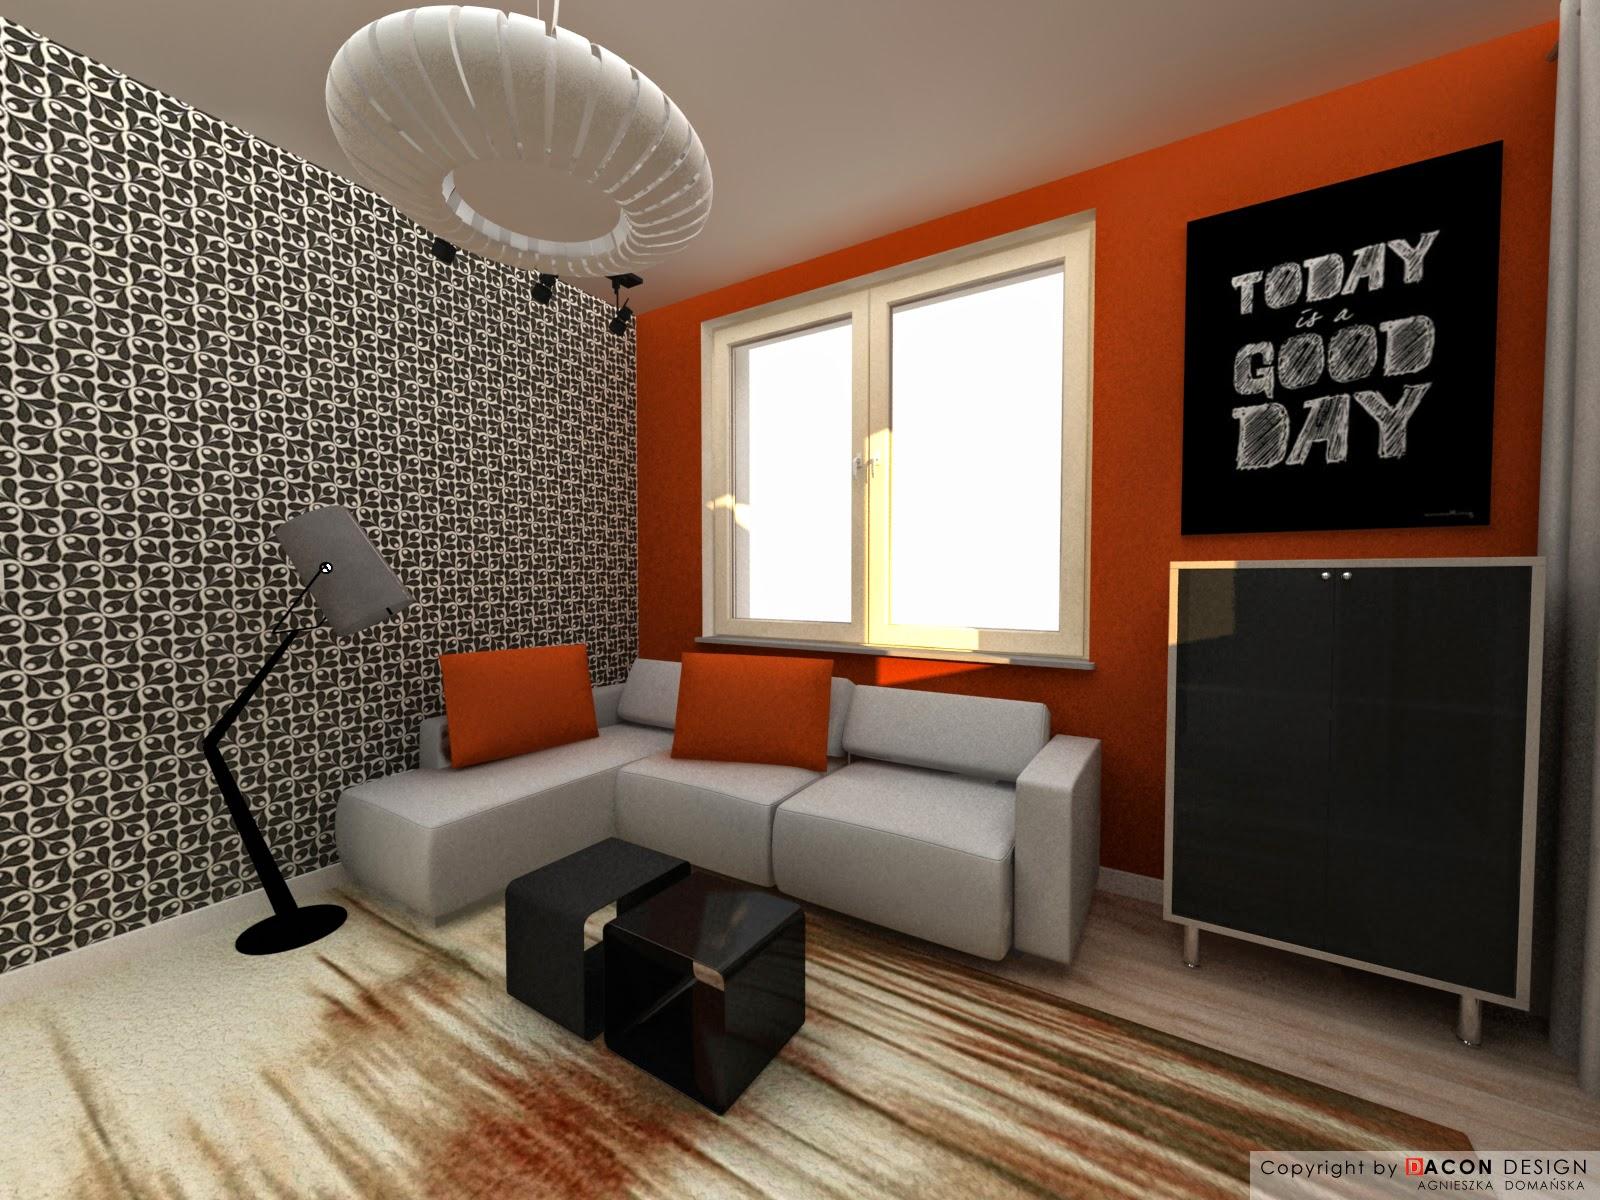 Dacon-Design-blog-projekty-wnetrz-Orla-Kiely